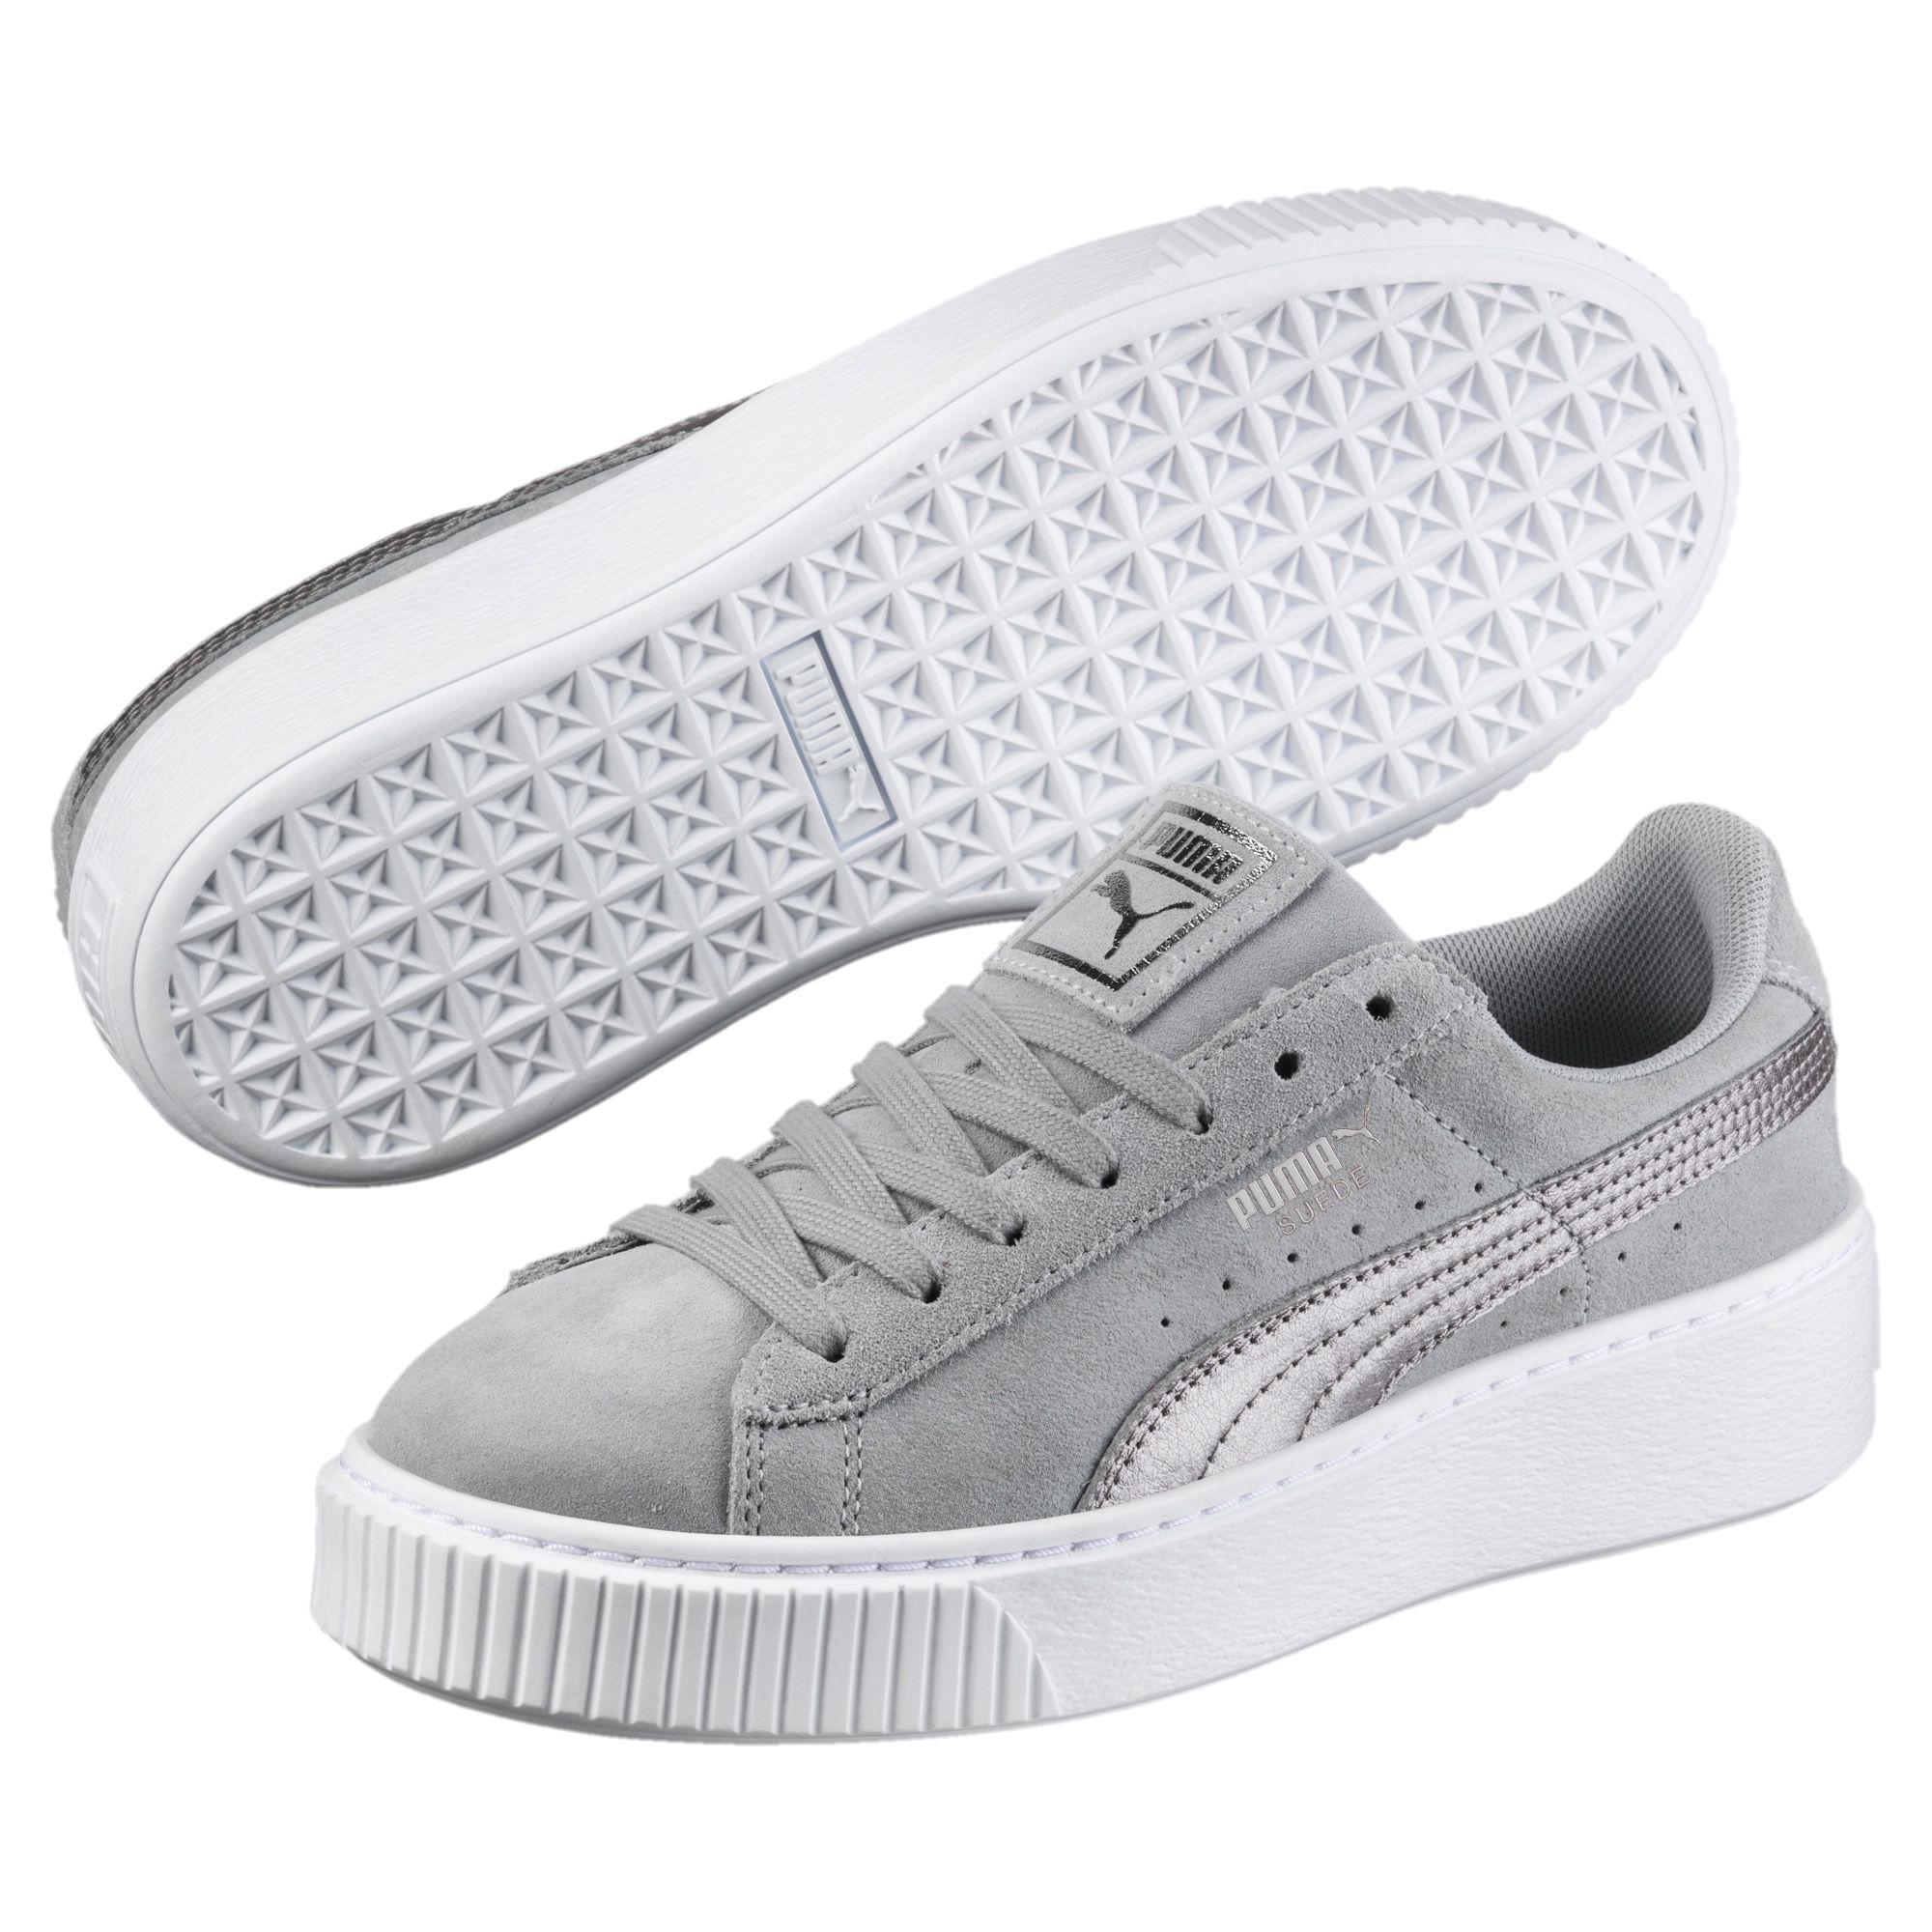 pretty nice 94fa7 36d53 Gray Suede Platform Metallic Safari Women's Sneakers